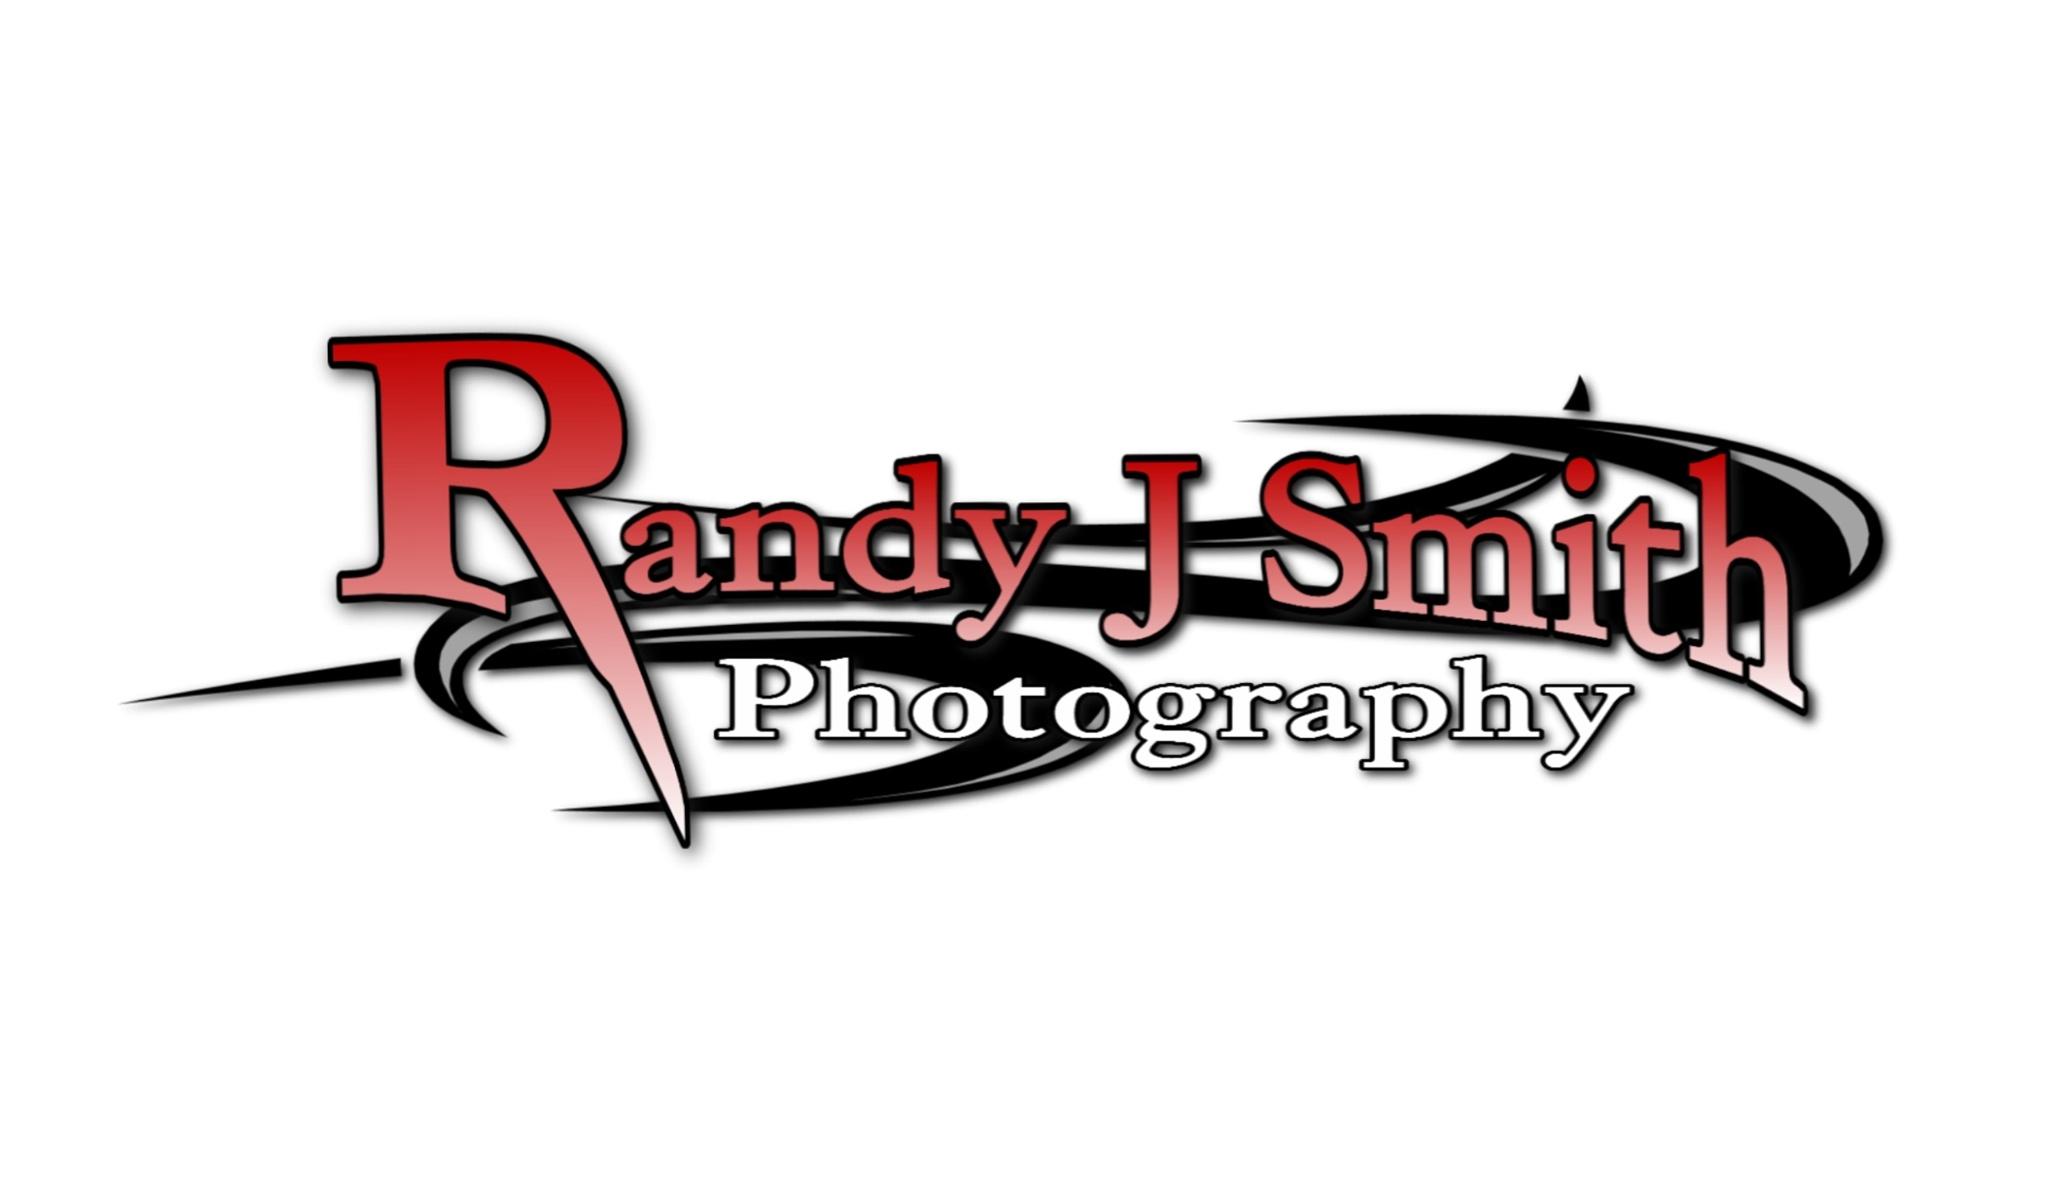 Randy J Smith Photography Logo by Randy J Smith Photography